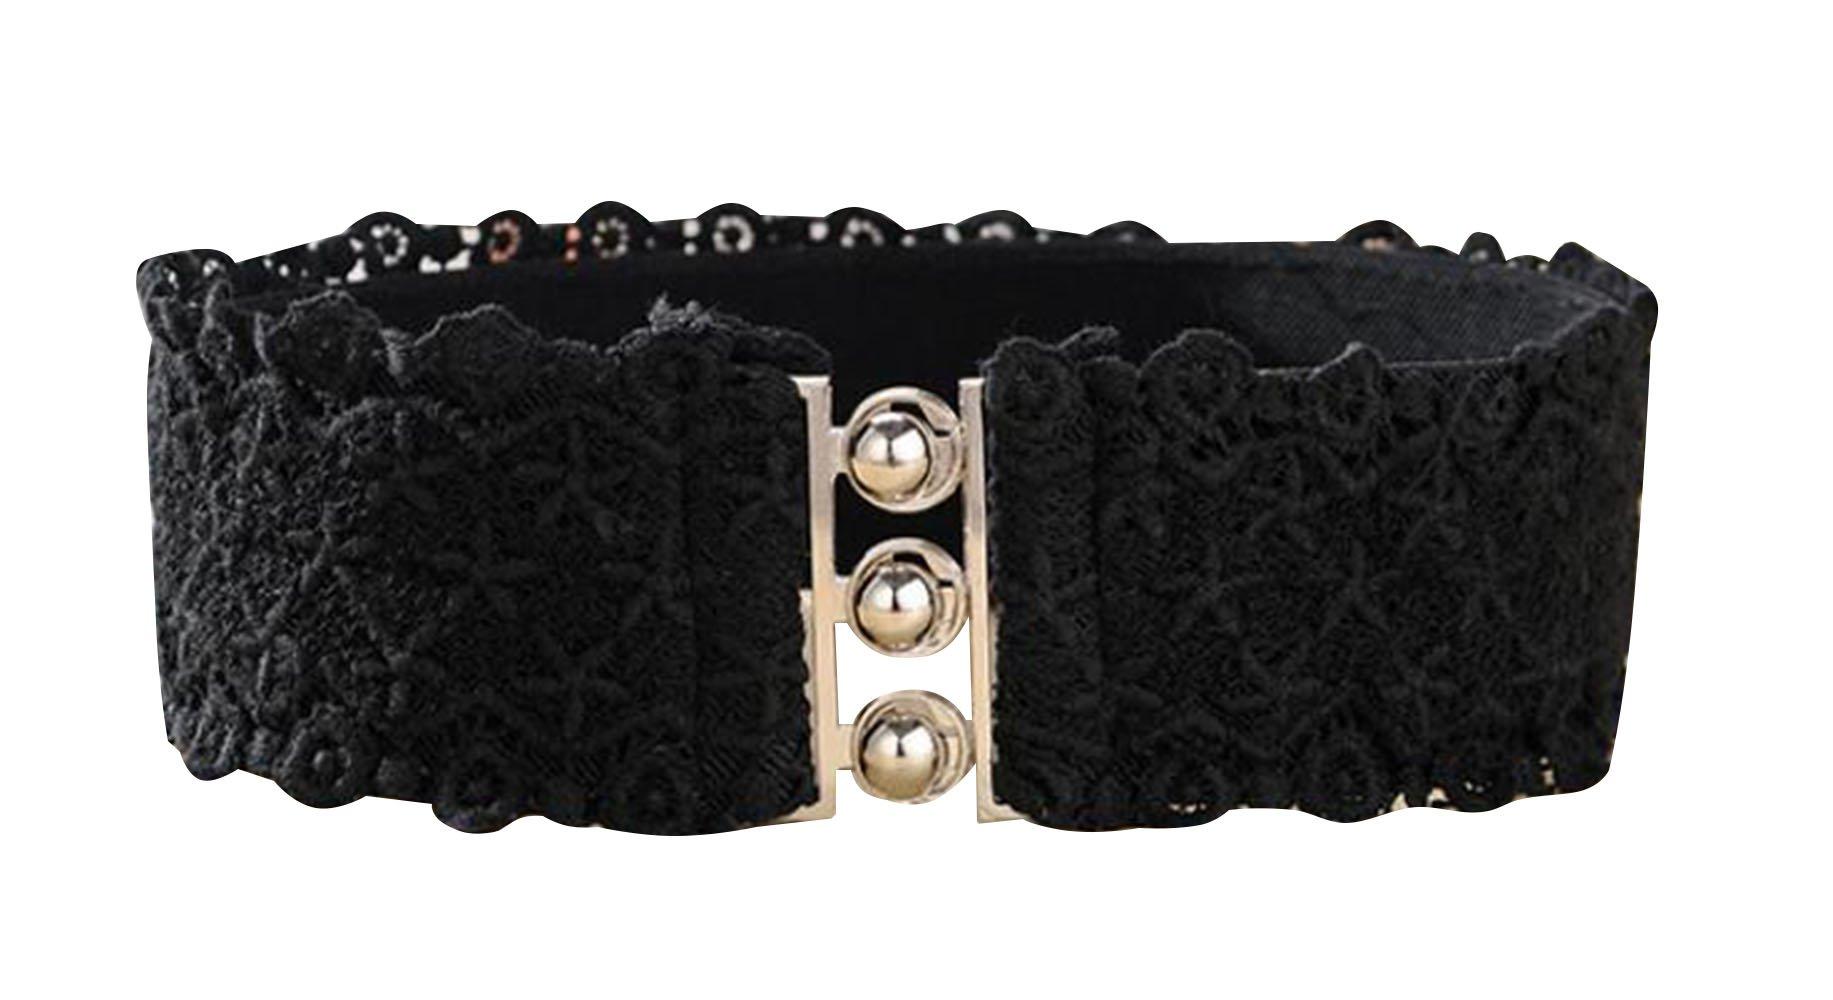 TRENDY XU Lace Wide Decorative Waist Belts Elastic Interlocking Buckles Waistband (Black) by Dress Waistbands Belt (Image #1)